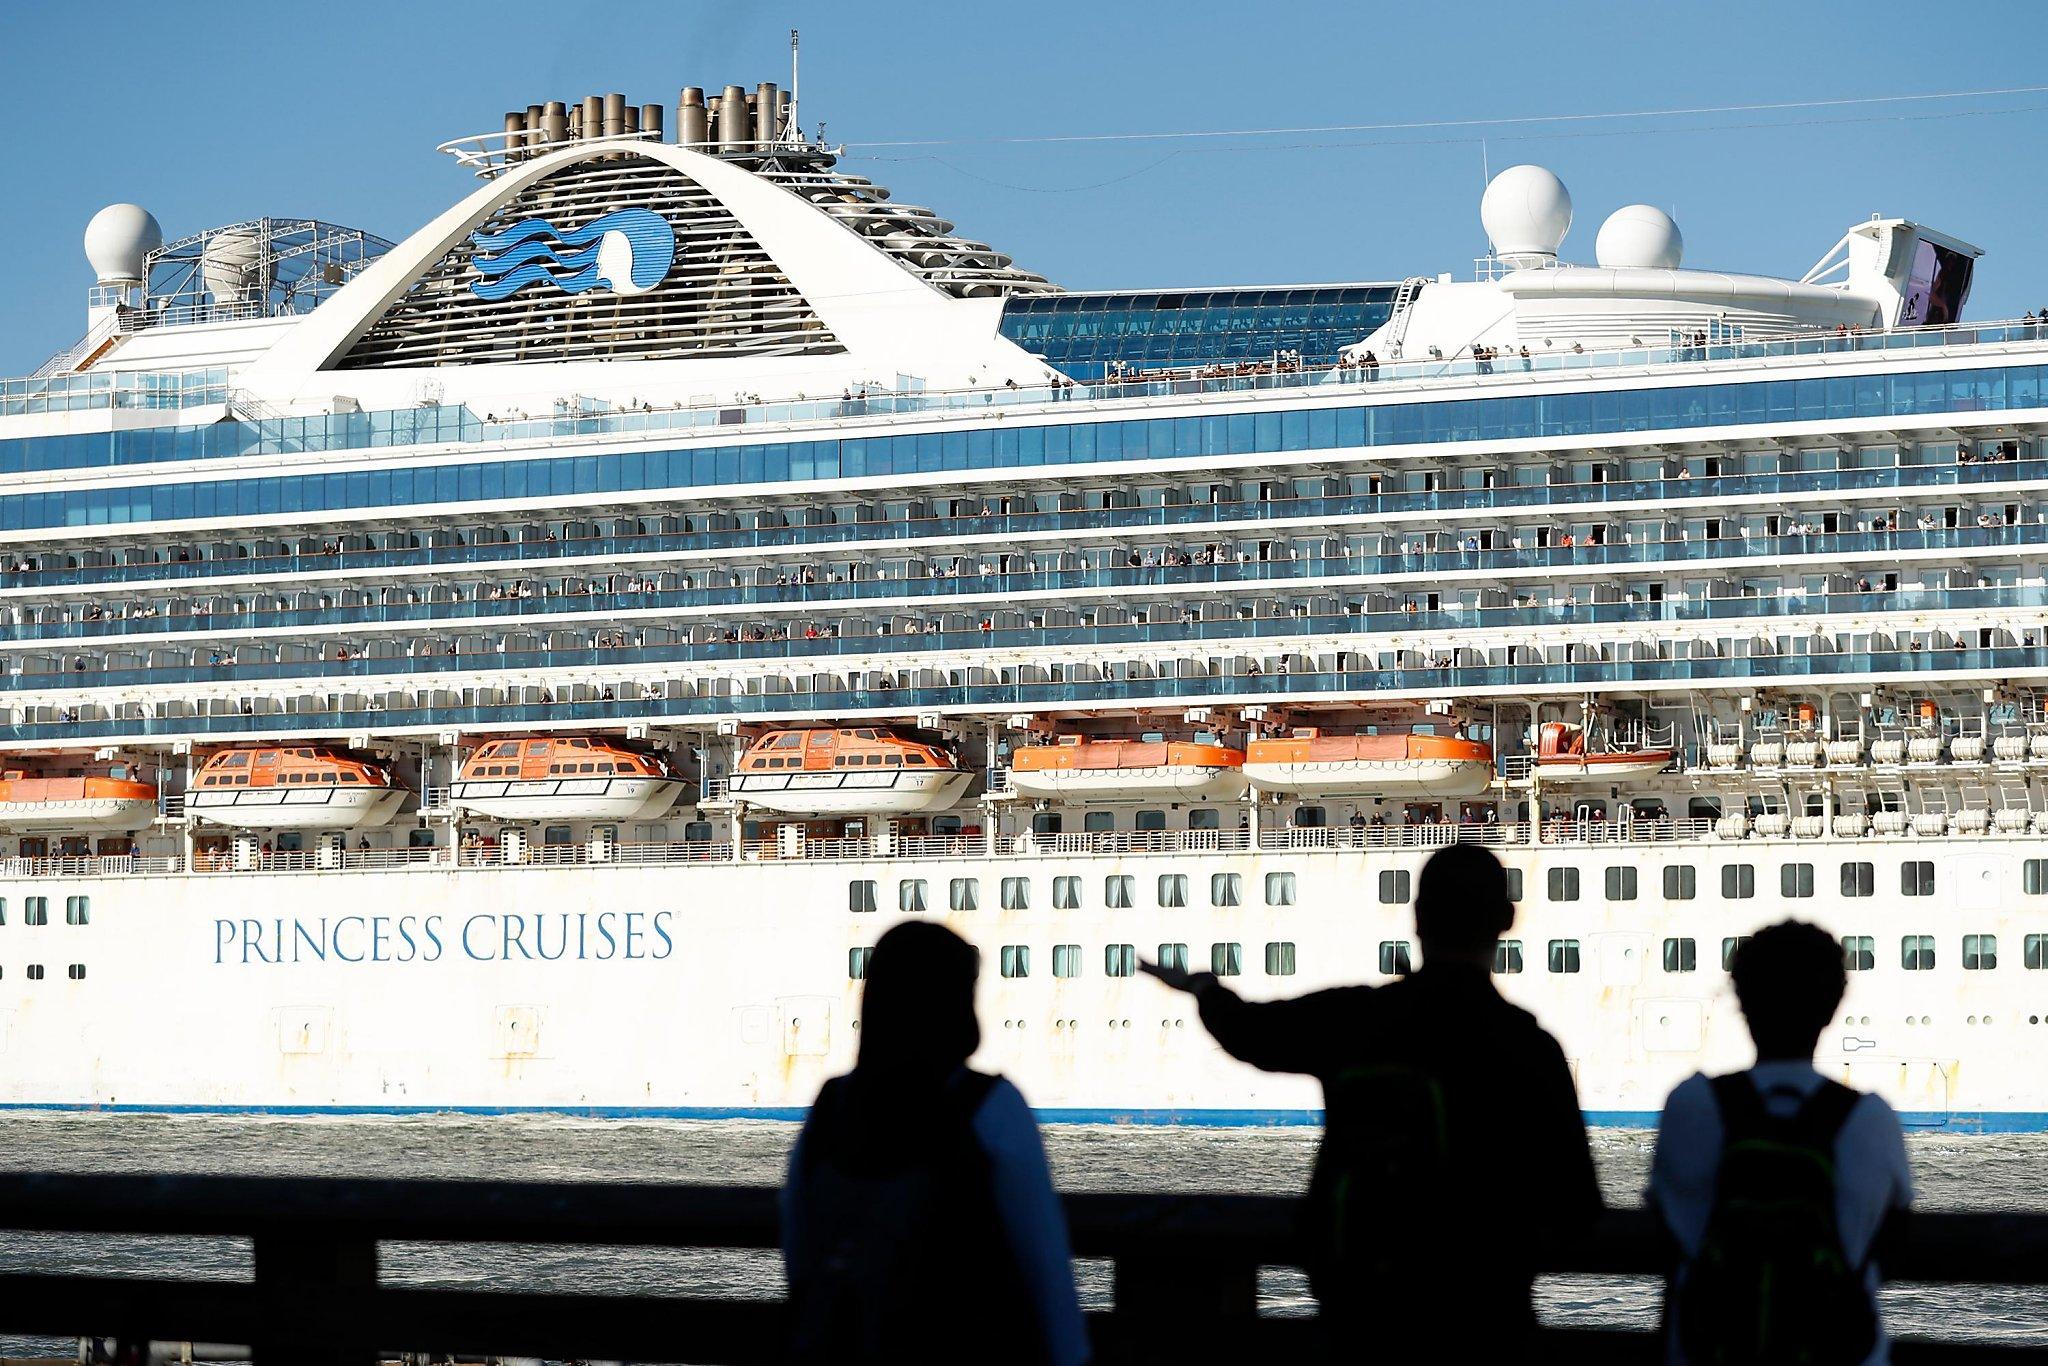 san francisco cruise ship terminal map It S On Everyone S Minds Coronavirus Fears Loom Amid Sf S Cruise san francisco cruise ship terminal map